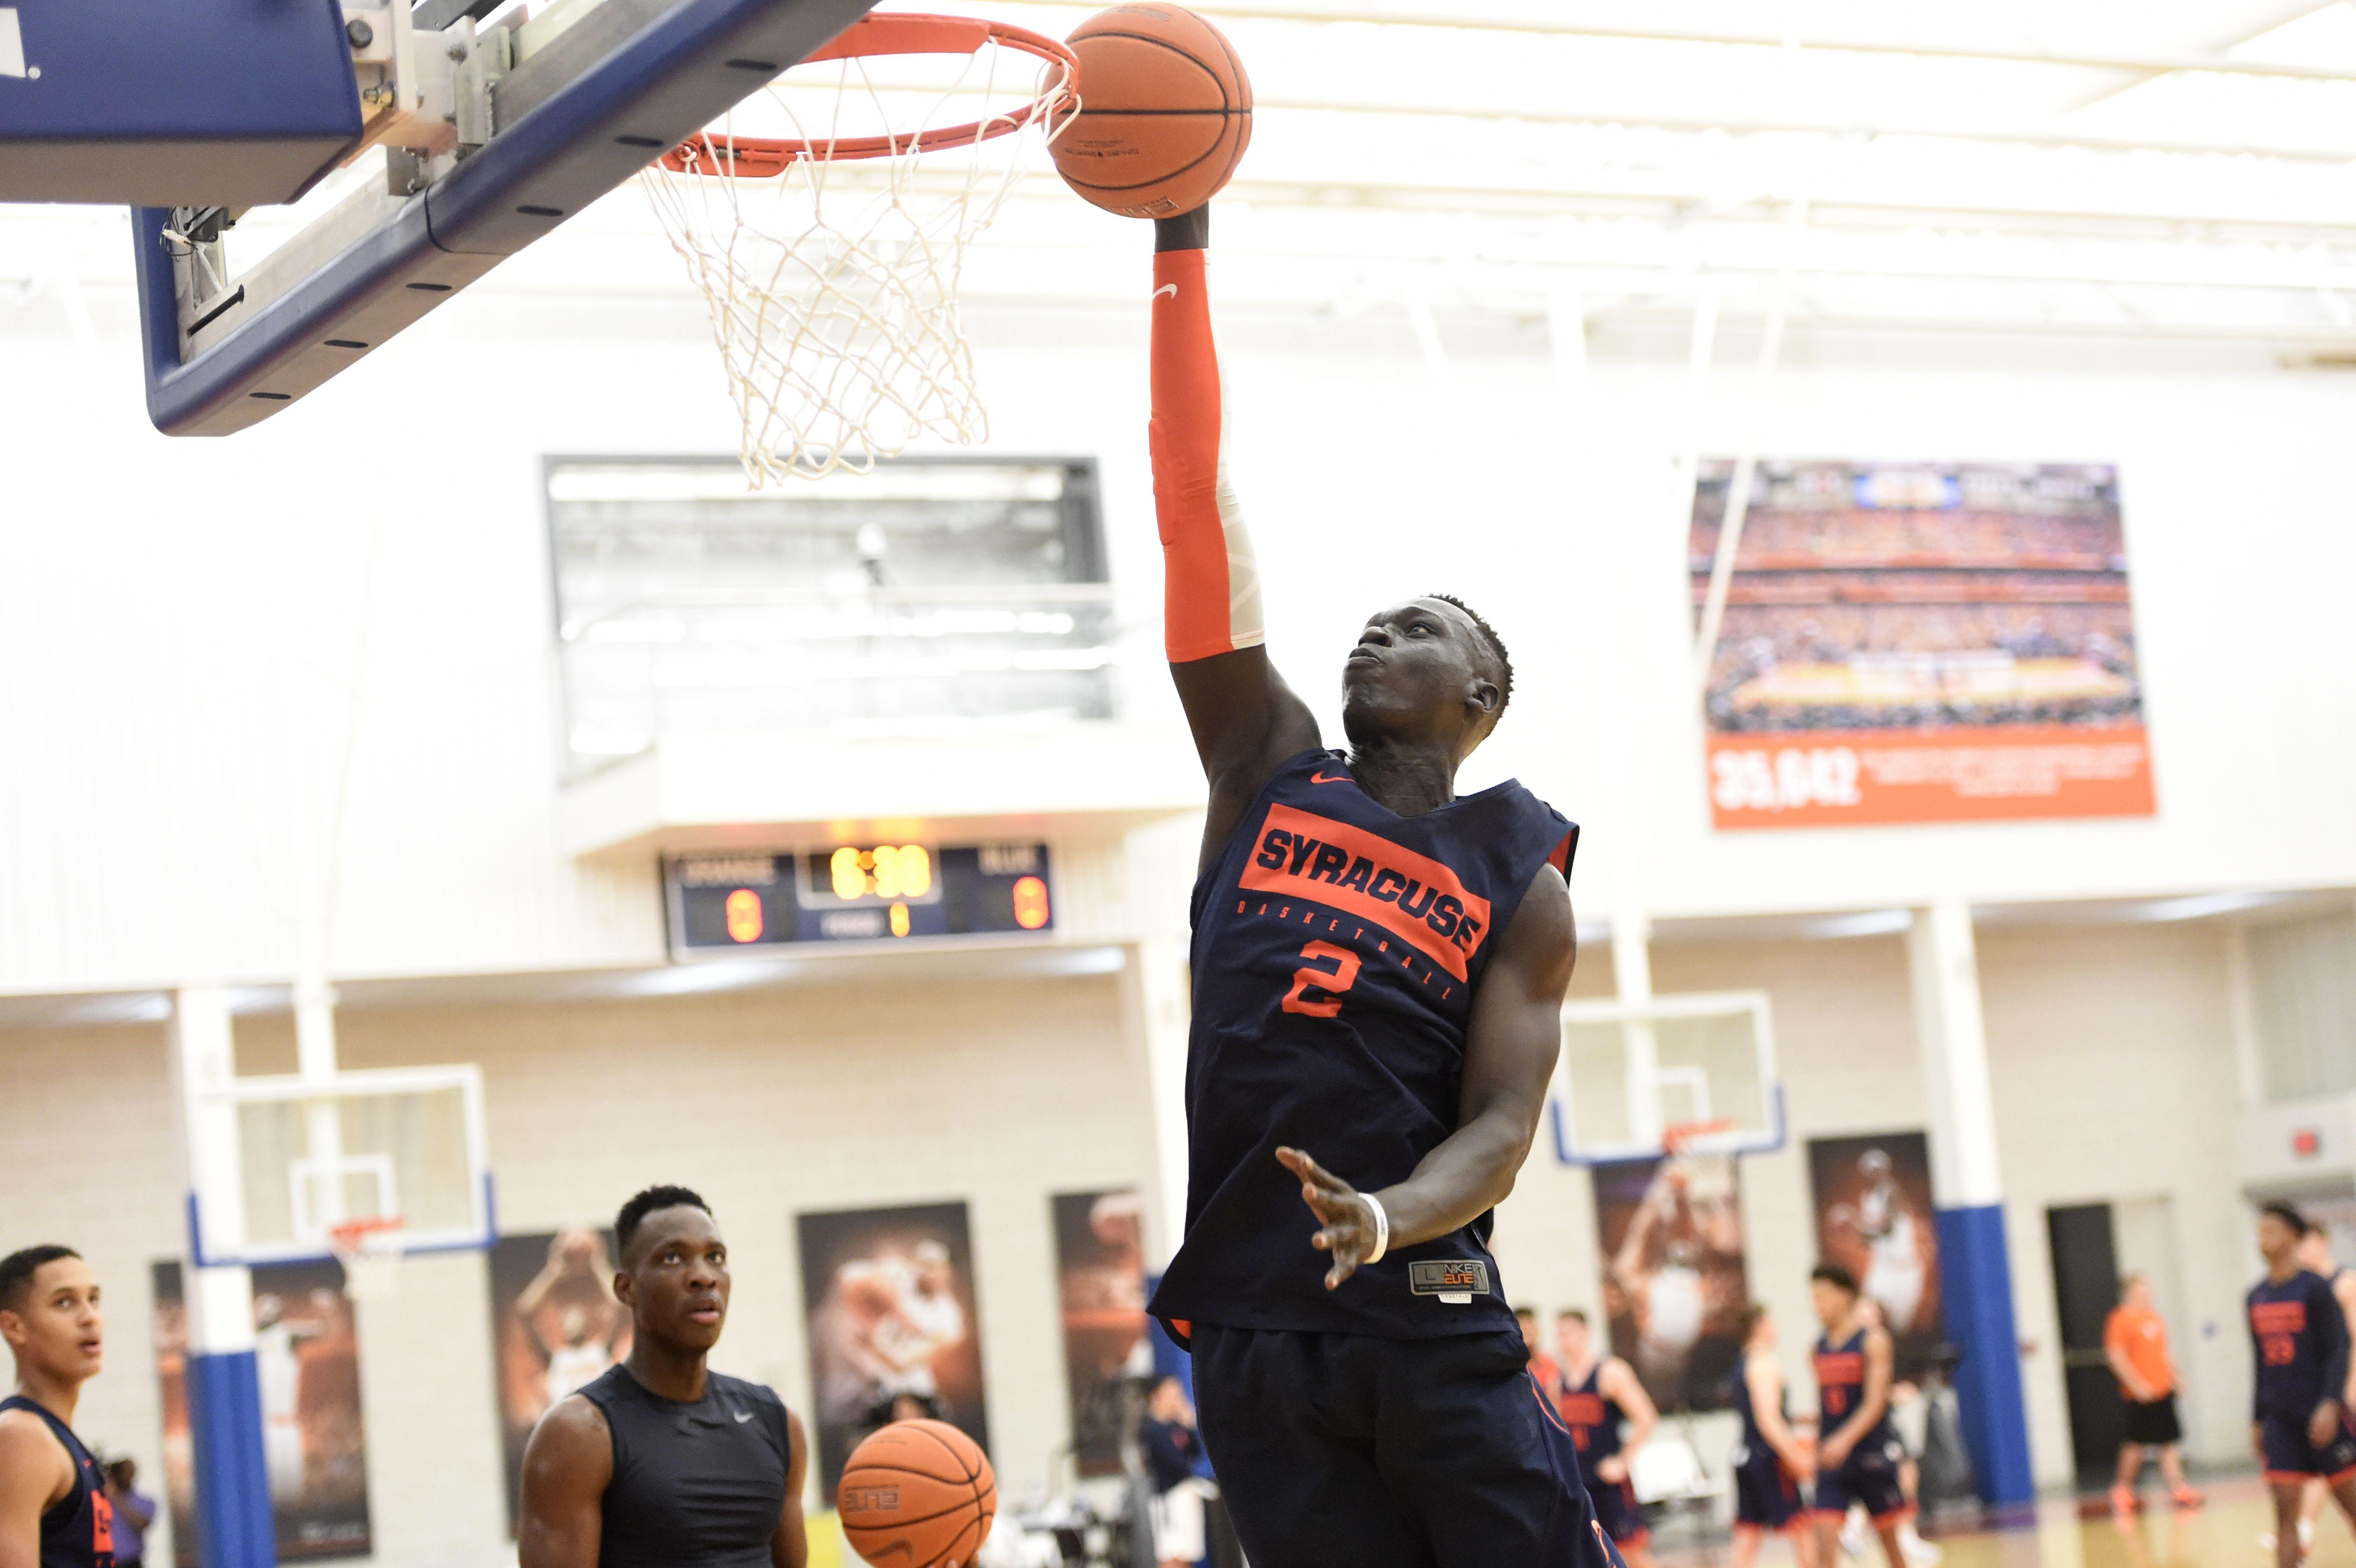 Syracuse Basketball Freshman John Bol Ajak Will Redshirt